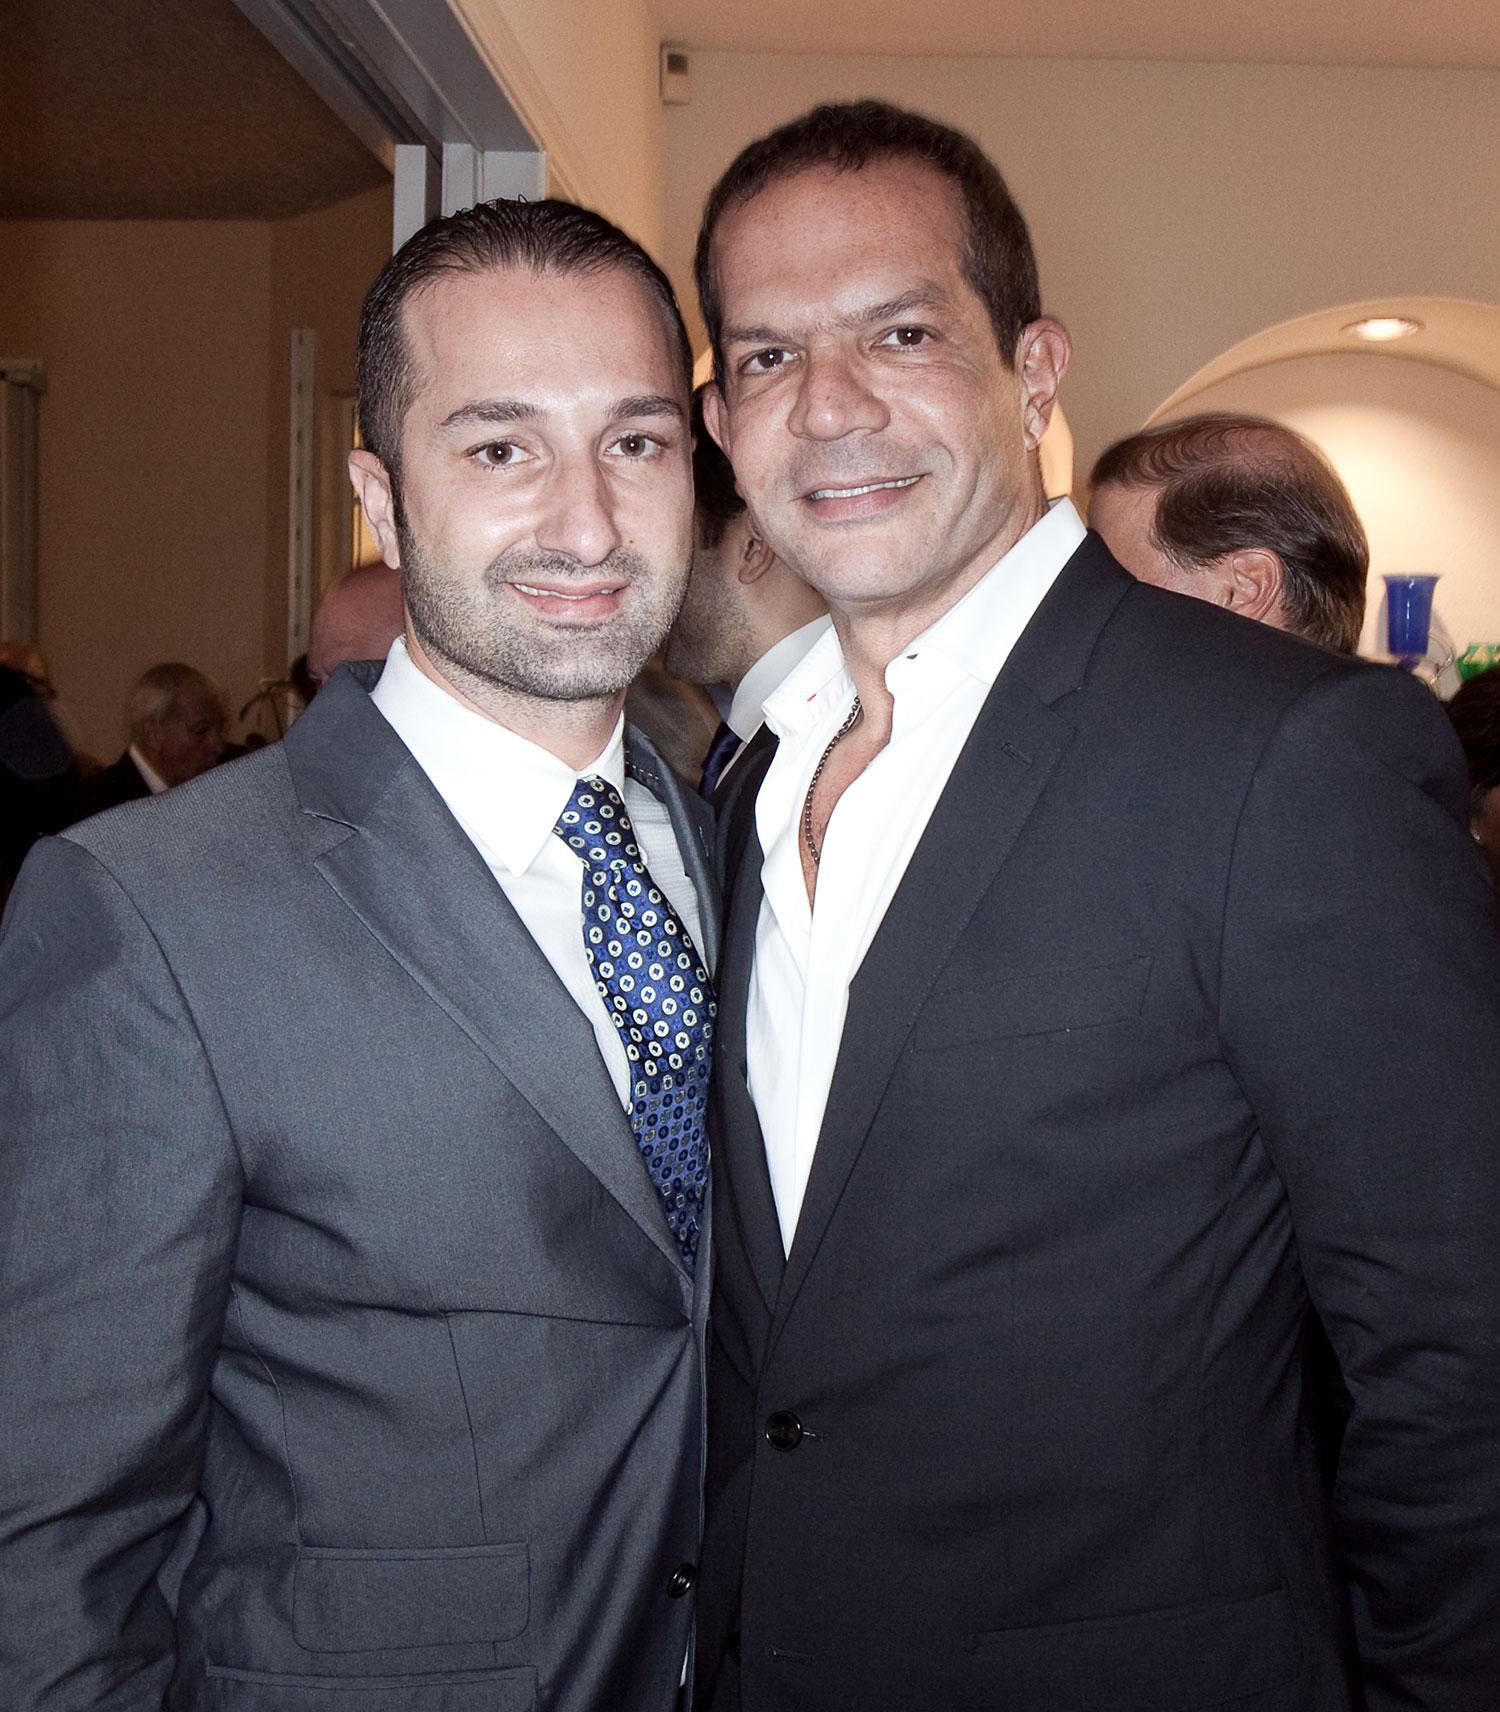 Miami Philanthropists Celebrate Italian Fashion Designer